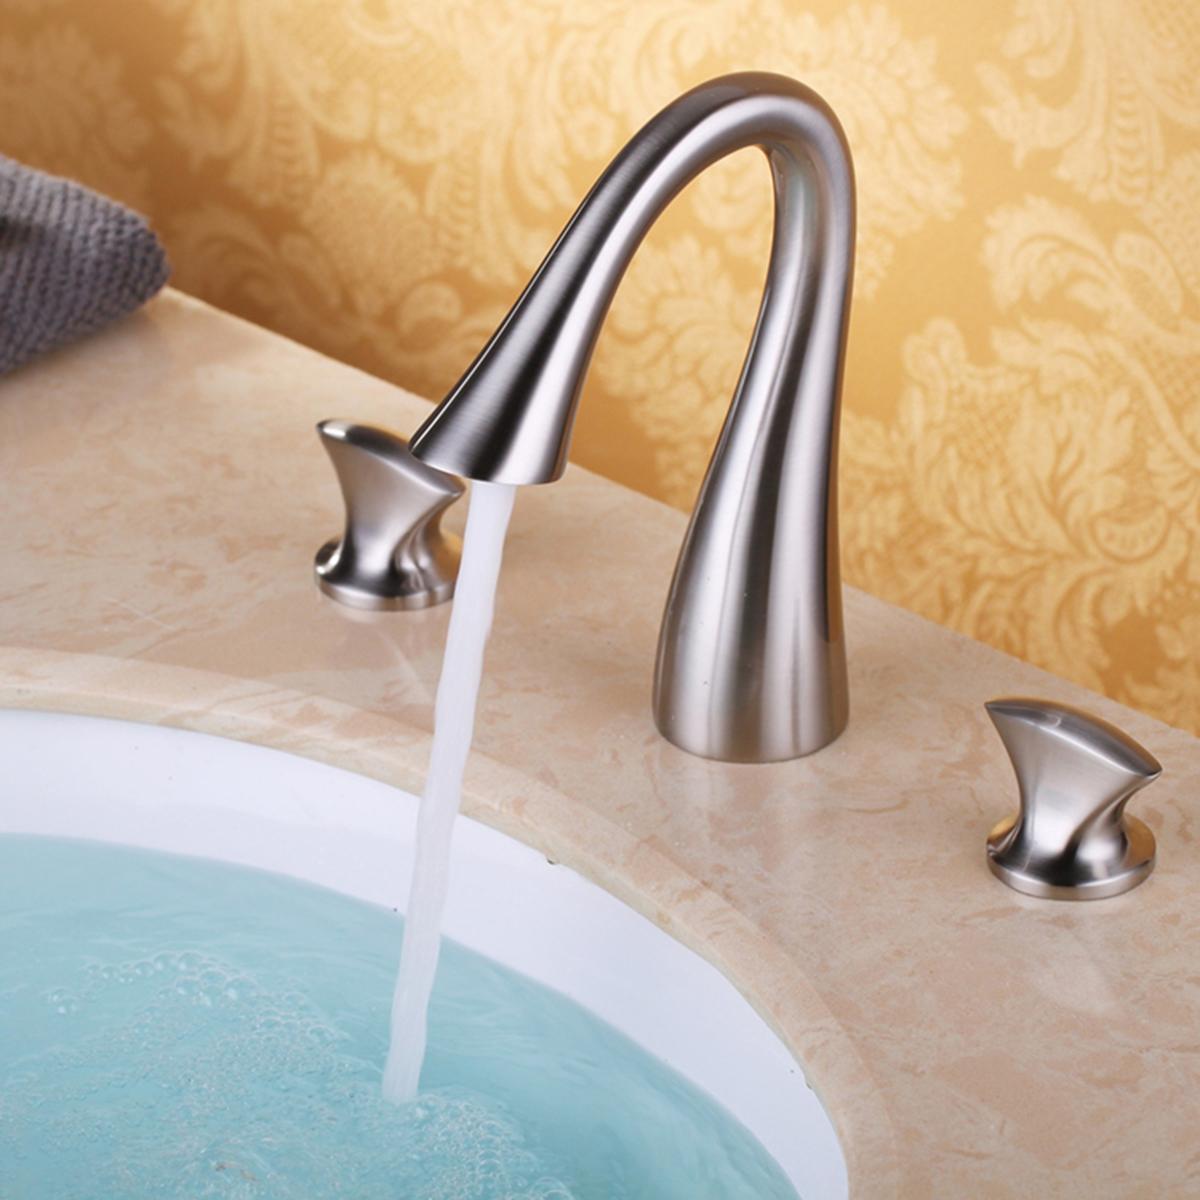 Luxury Bathroom Widespread Sink Faucet 3 Hole Mixer Tap Single